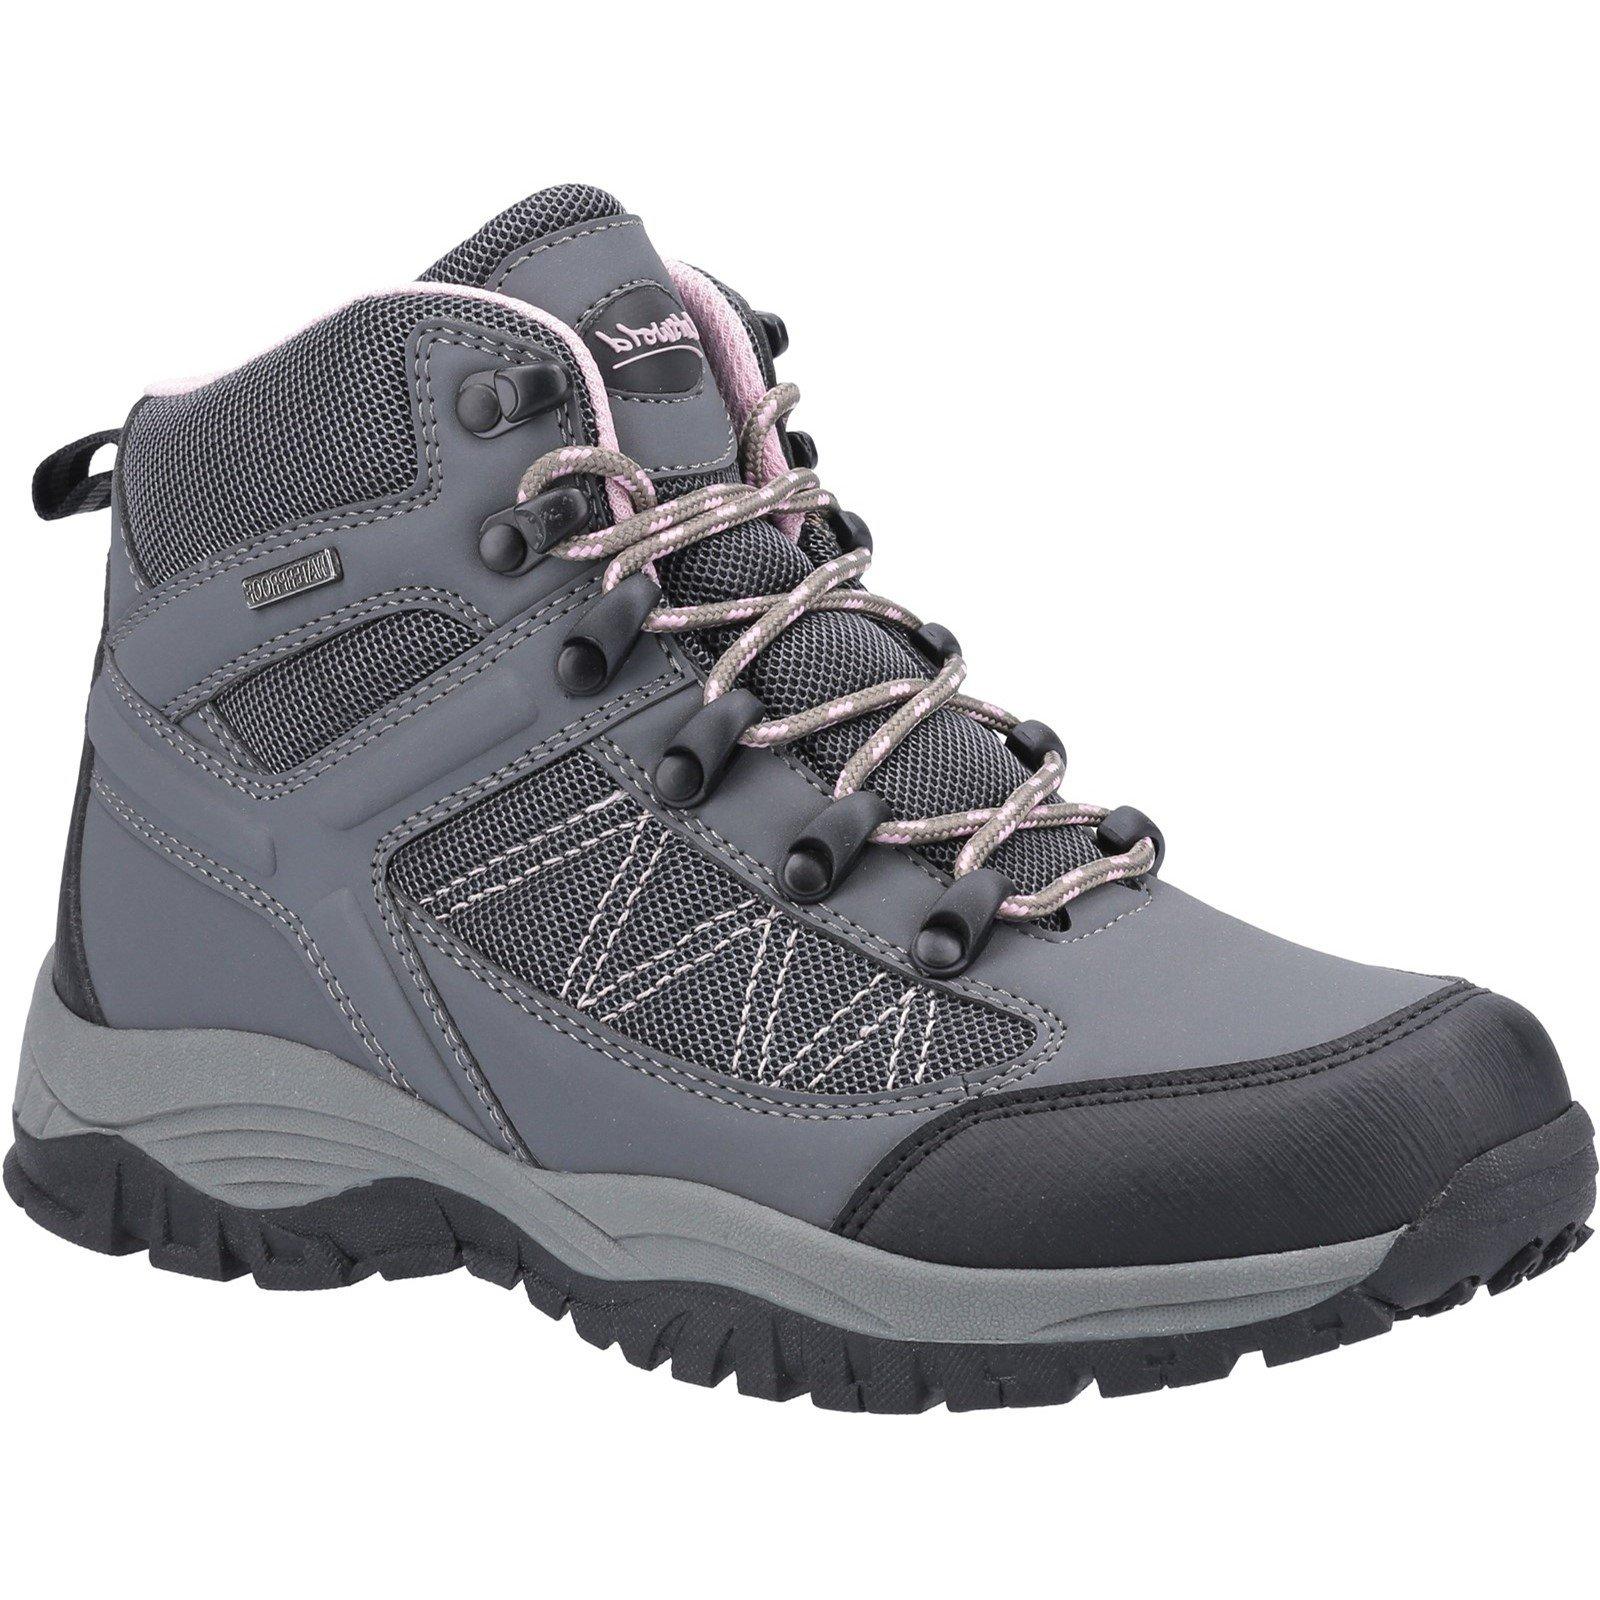 Cotswold Women's Maisemore Hiking Boot Grey 32986 - Grey 6